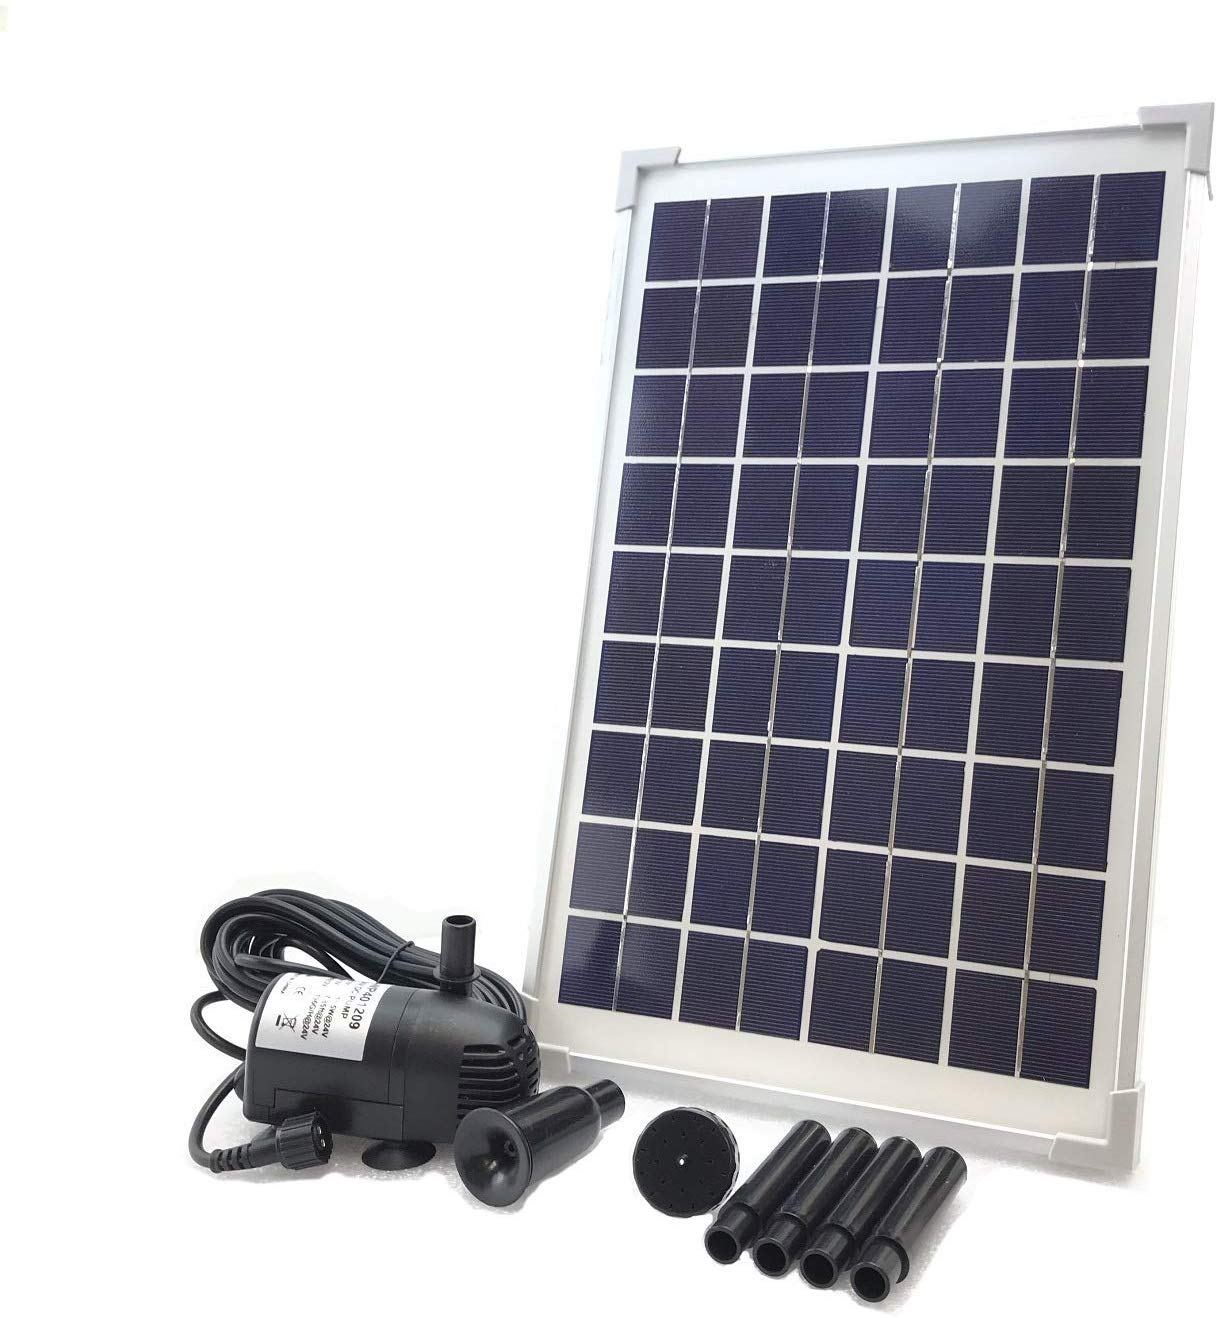 AEO Solar Powered Water Pump Kit